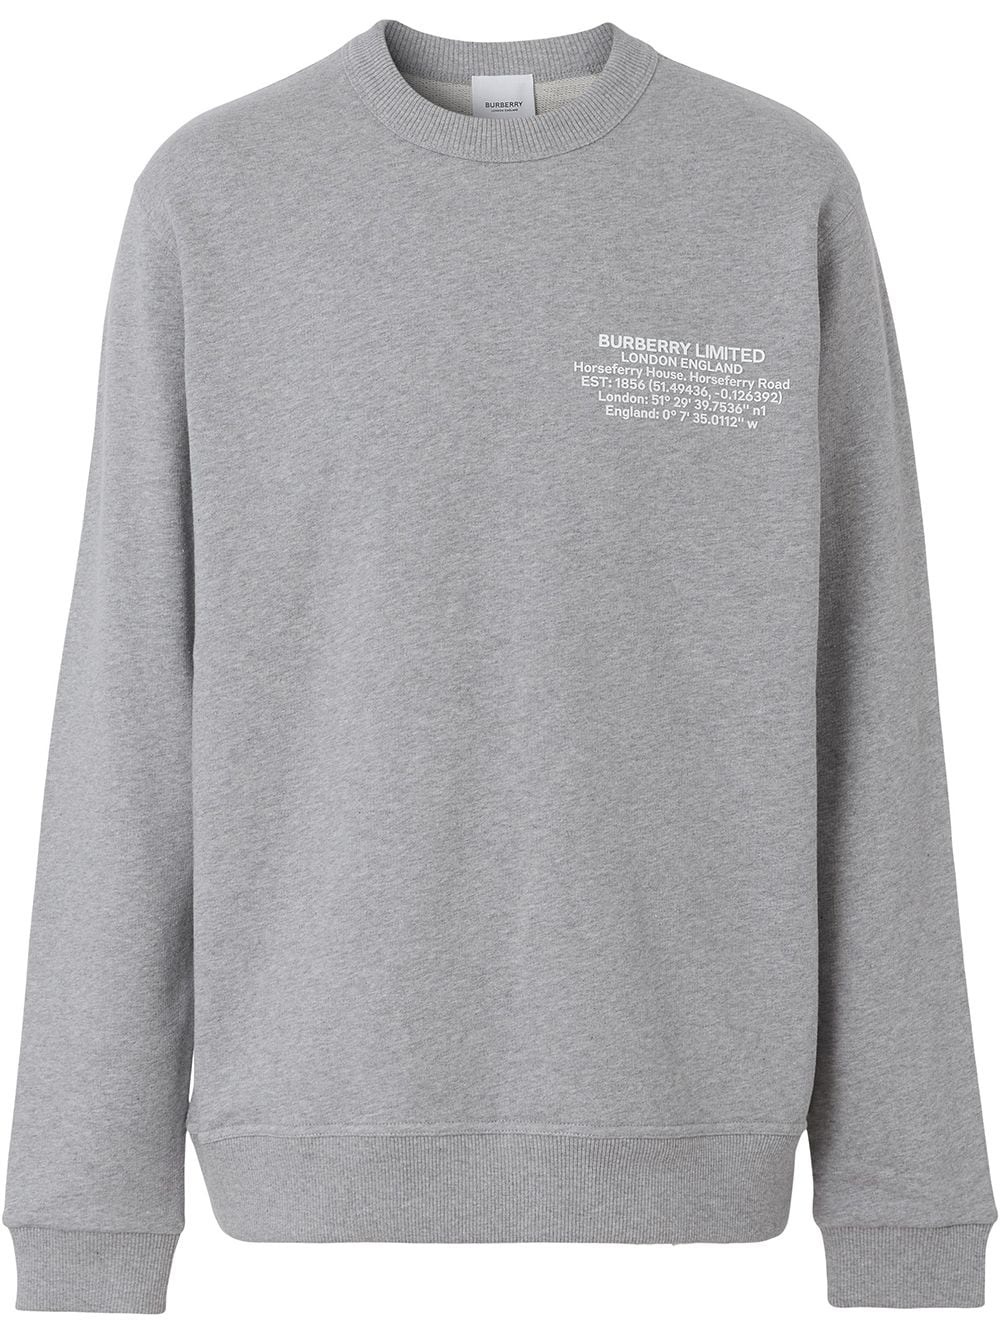 Burberry Location-print cotton sweatshirt - Grau